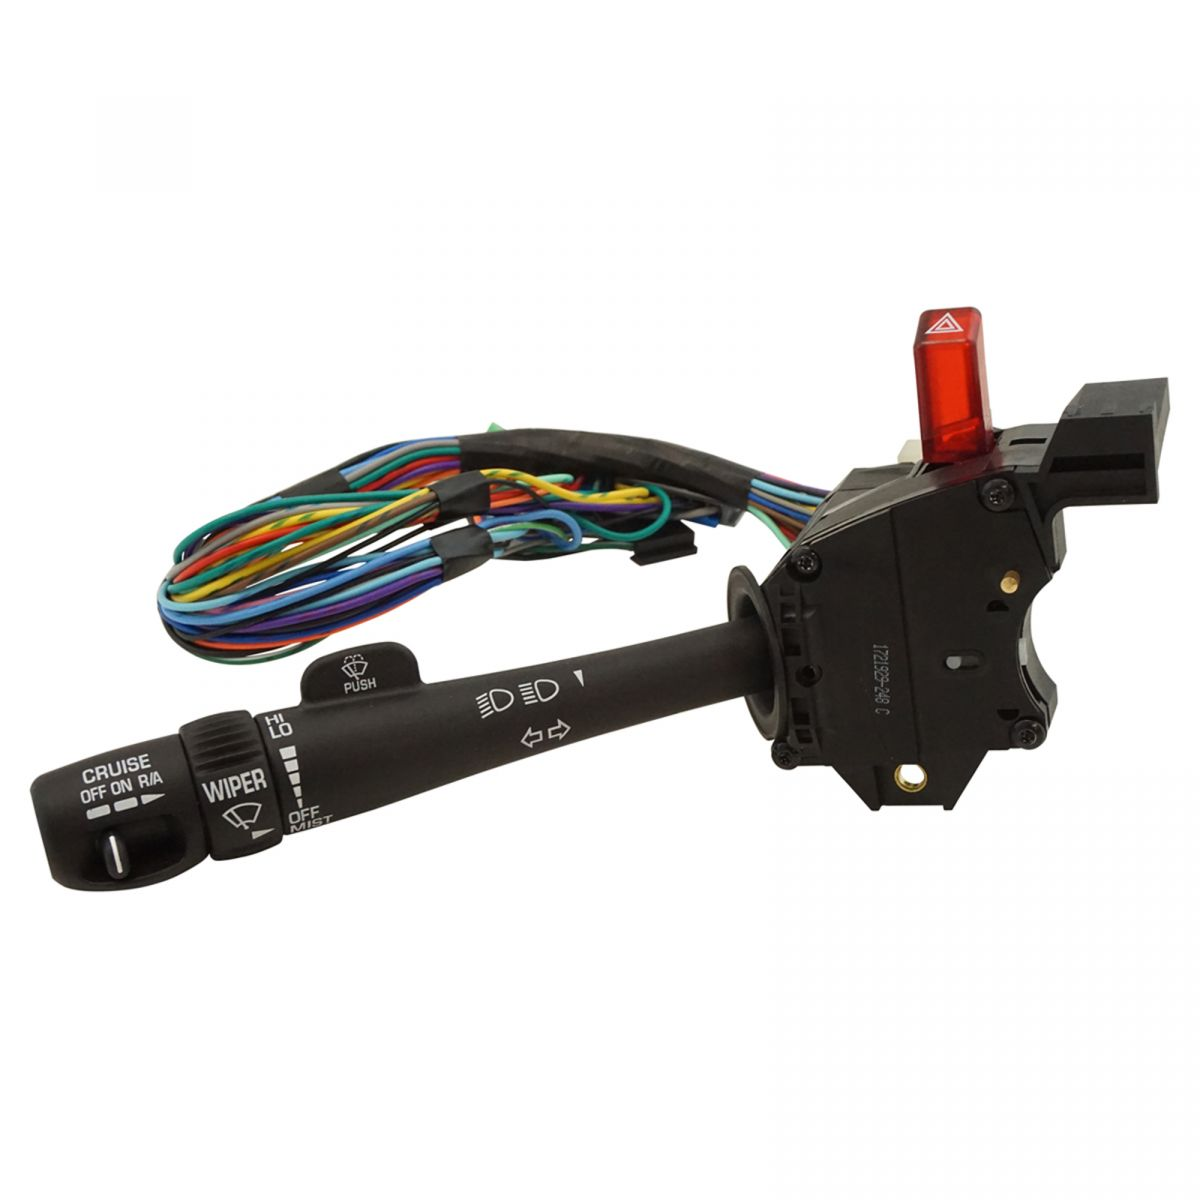 s10 cruise control wiring diagram runva winch solenoid windshield wiper arm turn signal lever